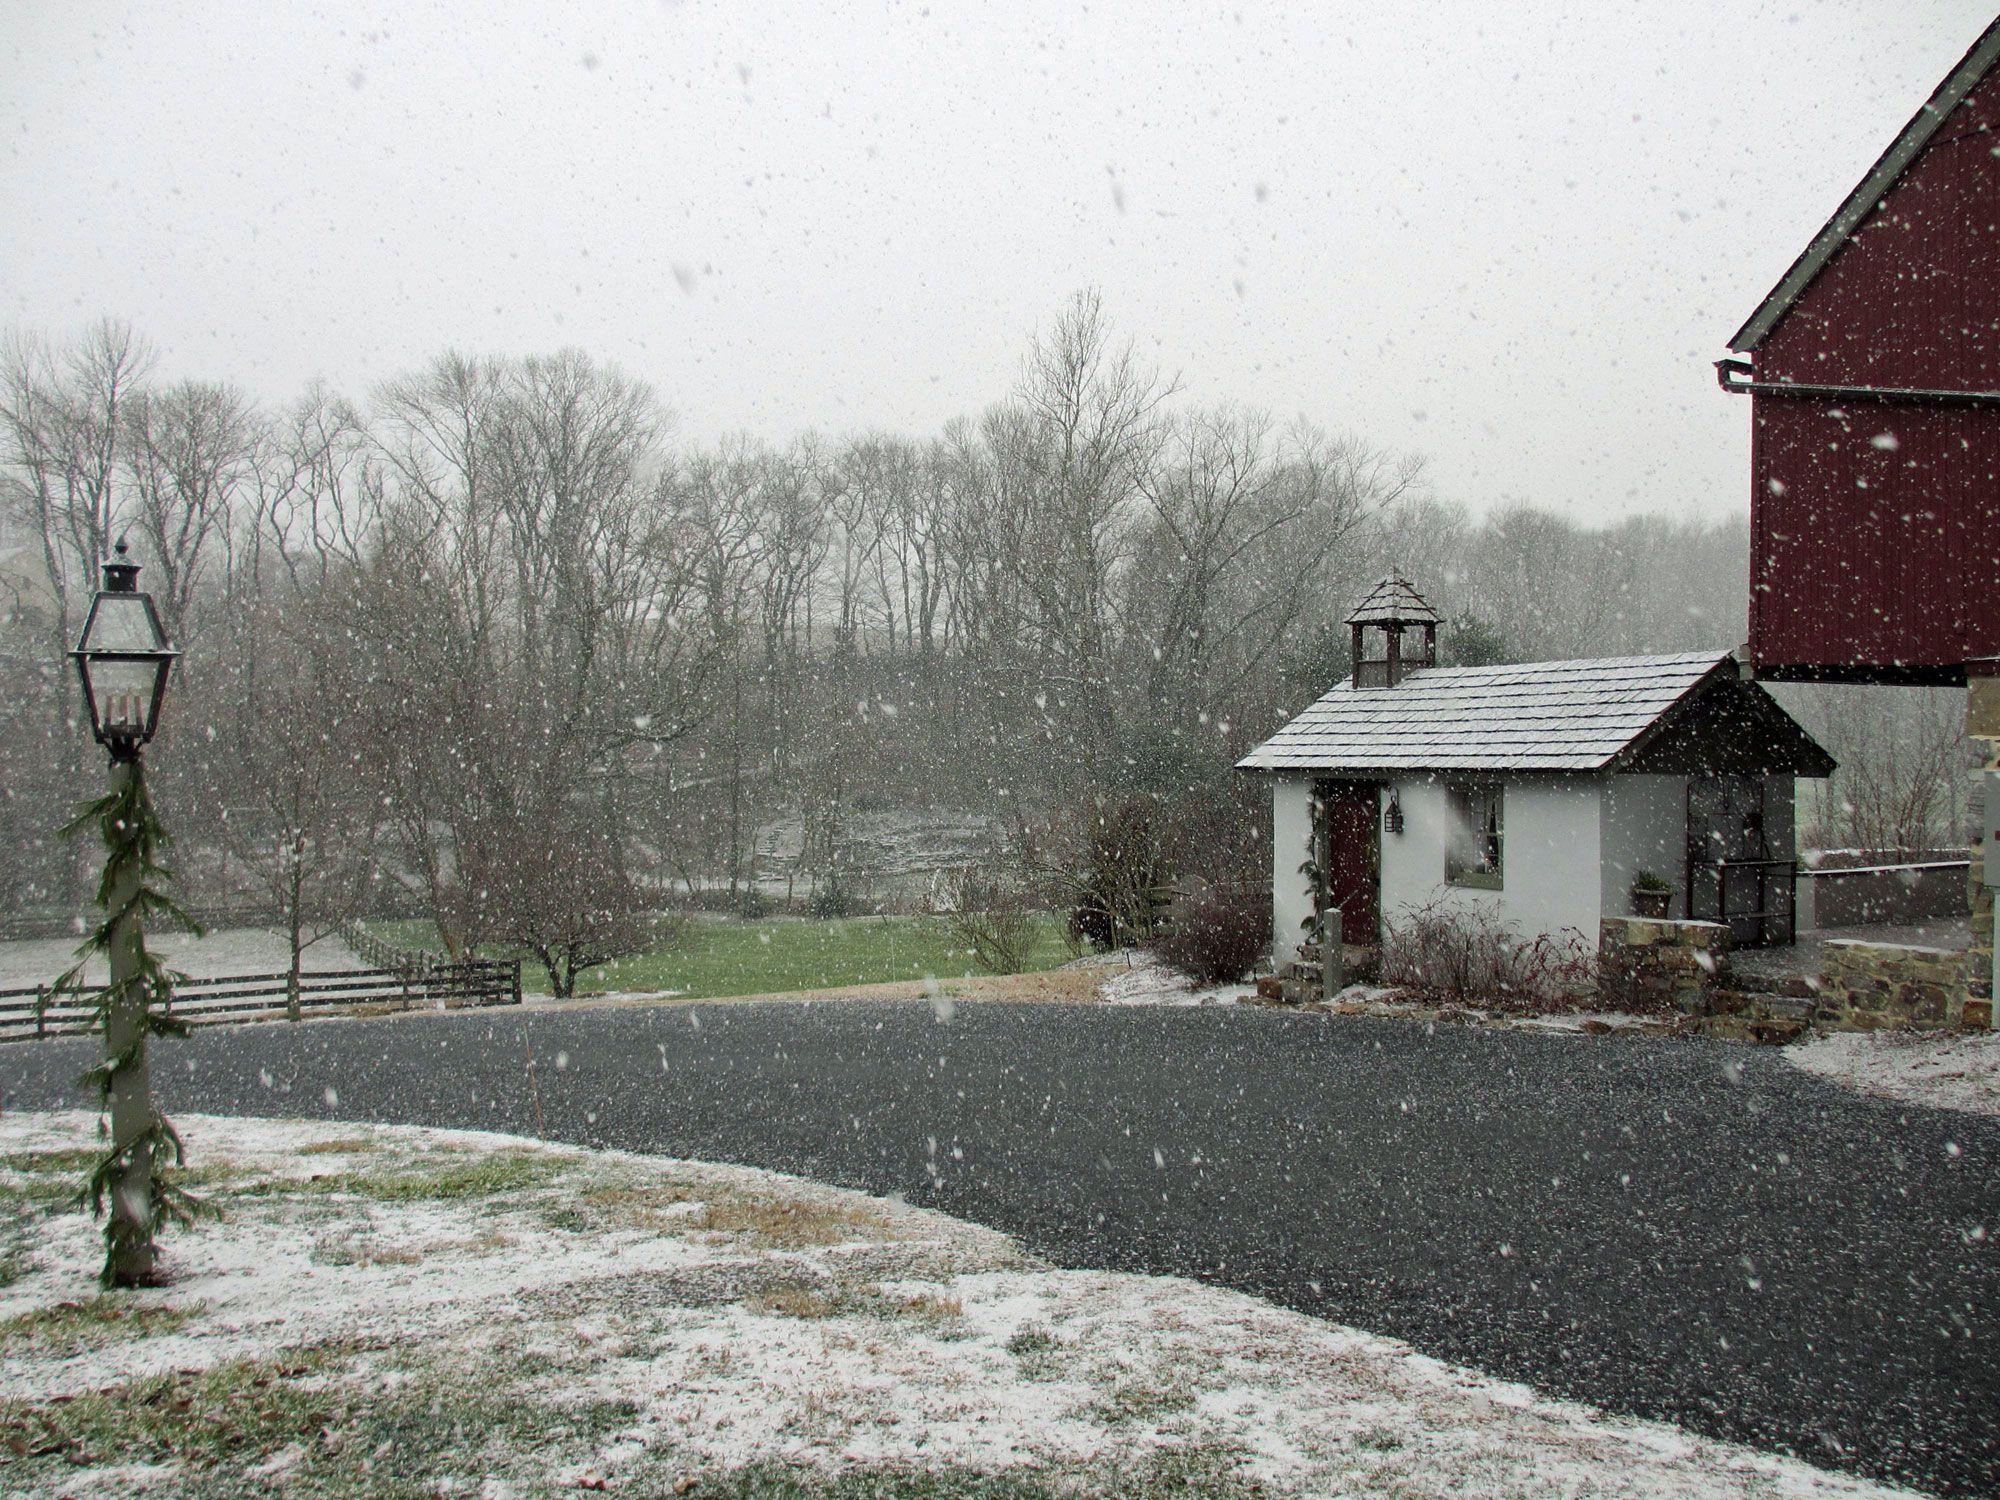 Pheasant Run Farm Bed and Breakfast in winter http//www